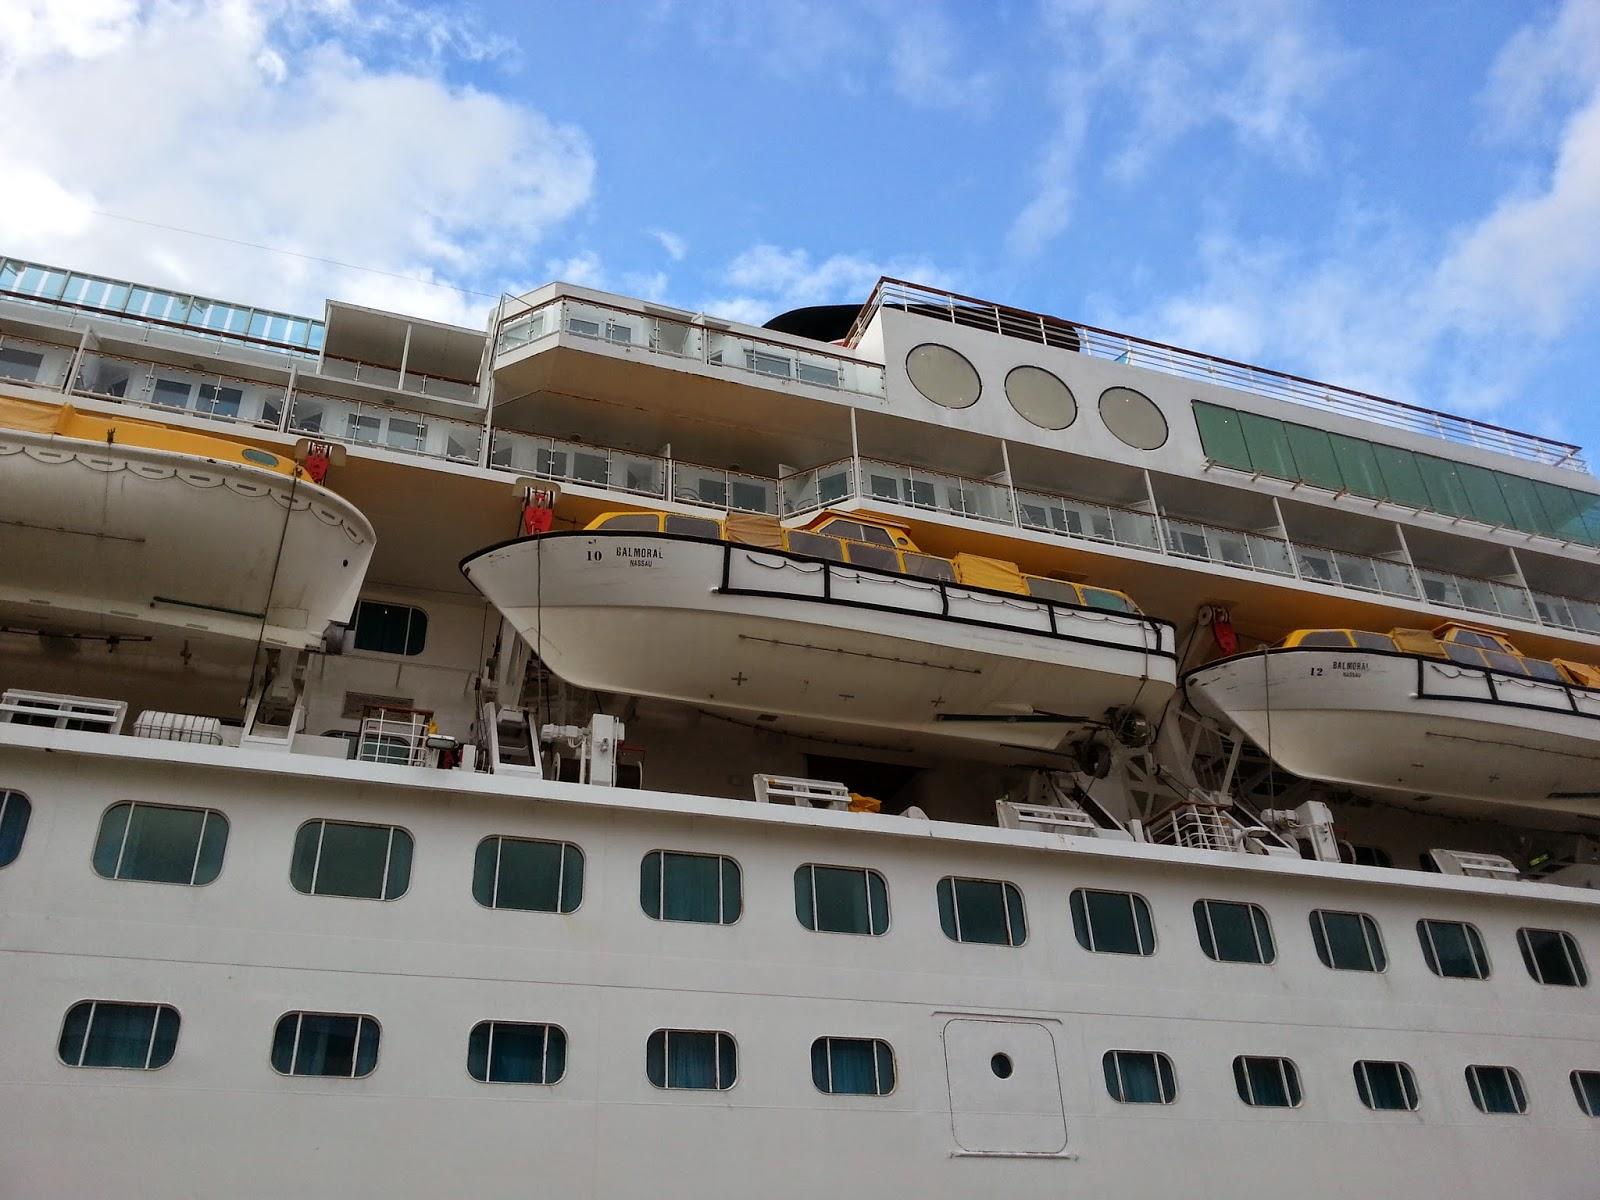 Cruise Ship Balmoral in Bergen